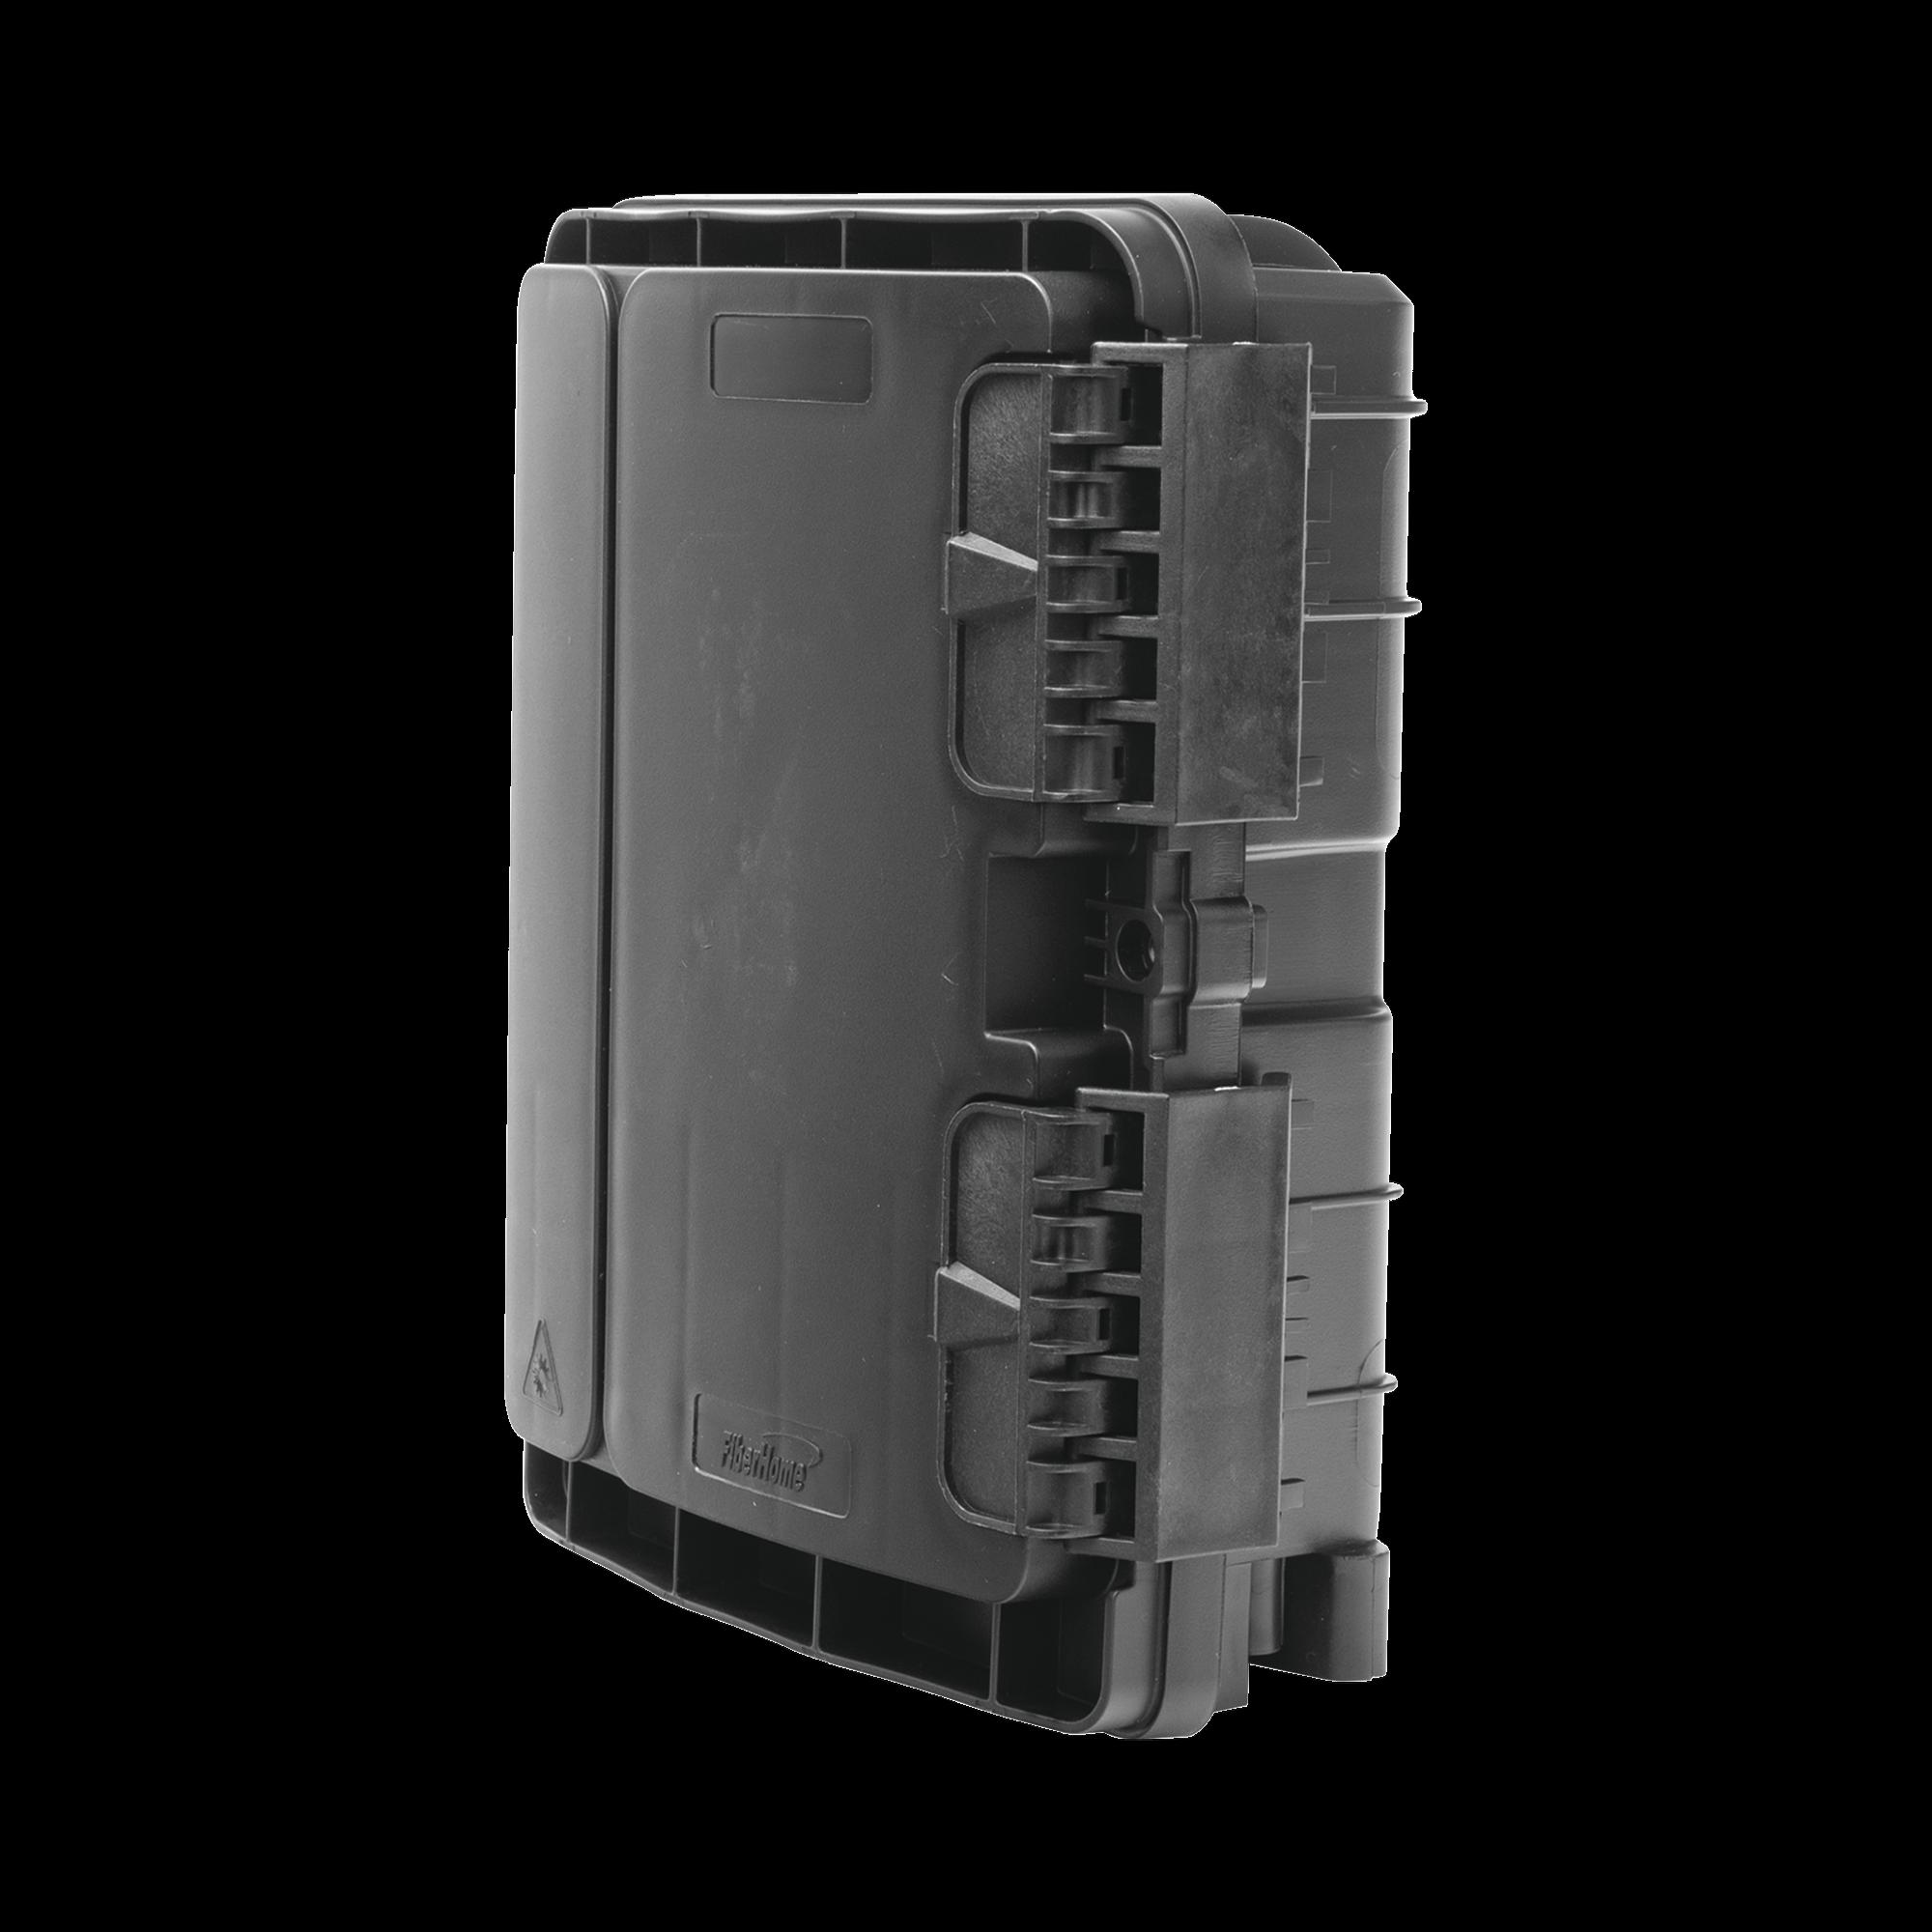 Cierre de Empalme para 20 fusiones de fibra óptica, Exterior, 8 acopladores SC/APC, incluye splitter 1x8, IP65